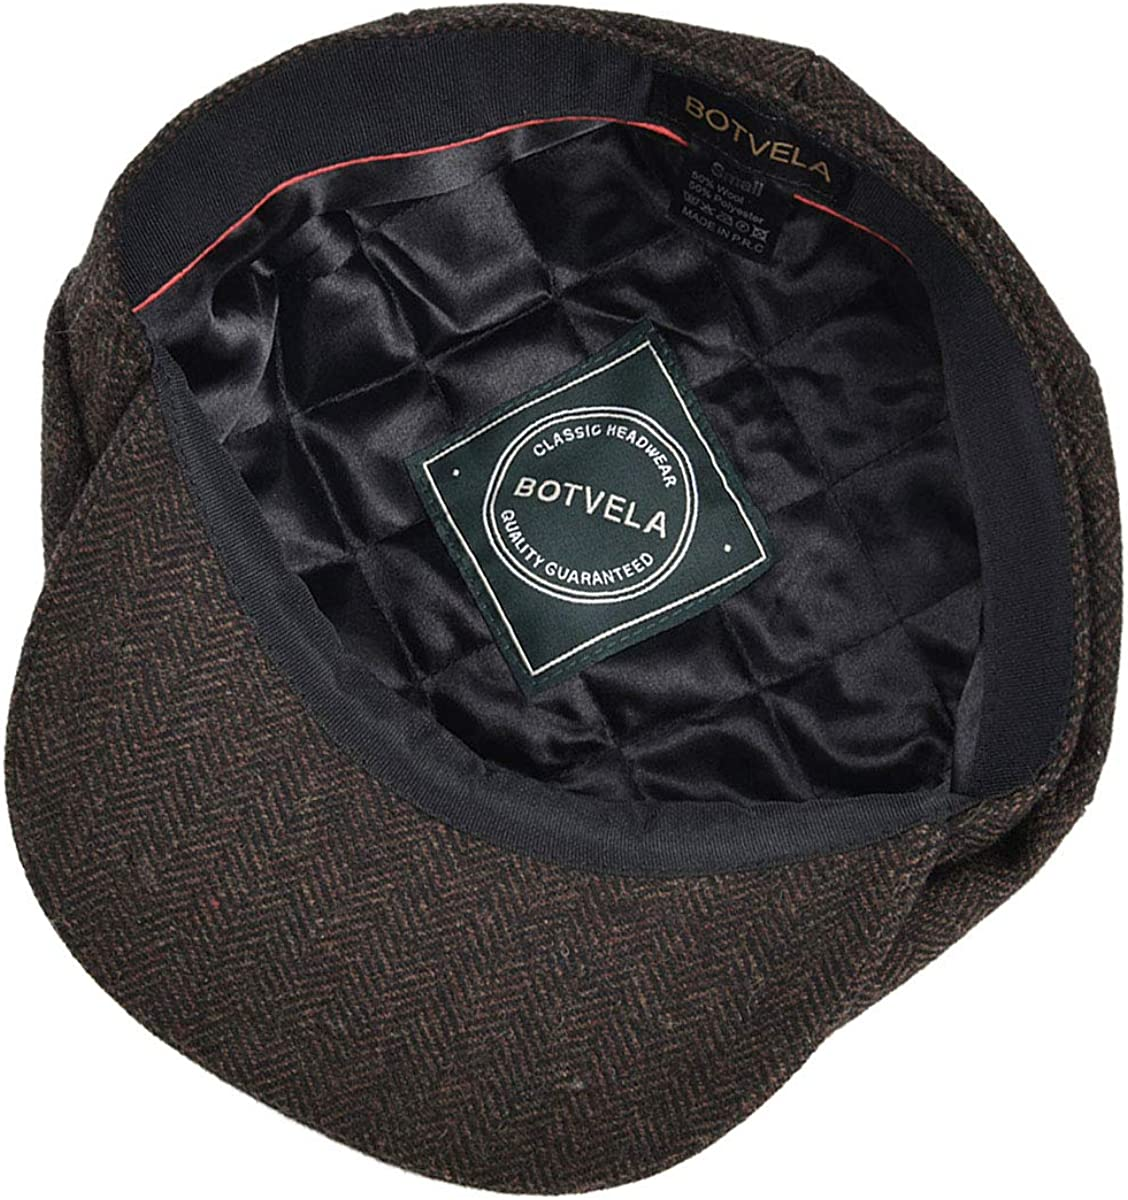 NEW Newsboy Cap - 100/% Sheepskin by Northern Hats SKU: 08K-BLK-AS Black